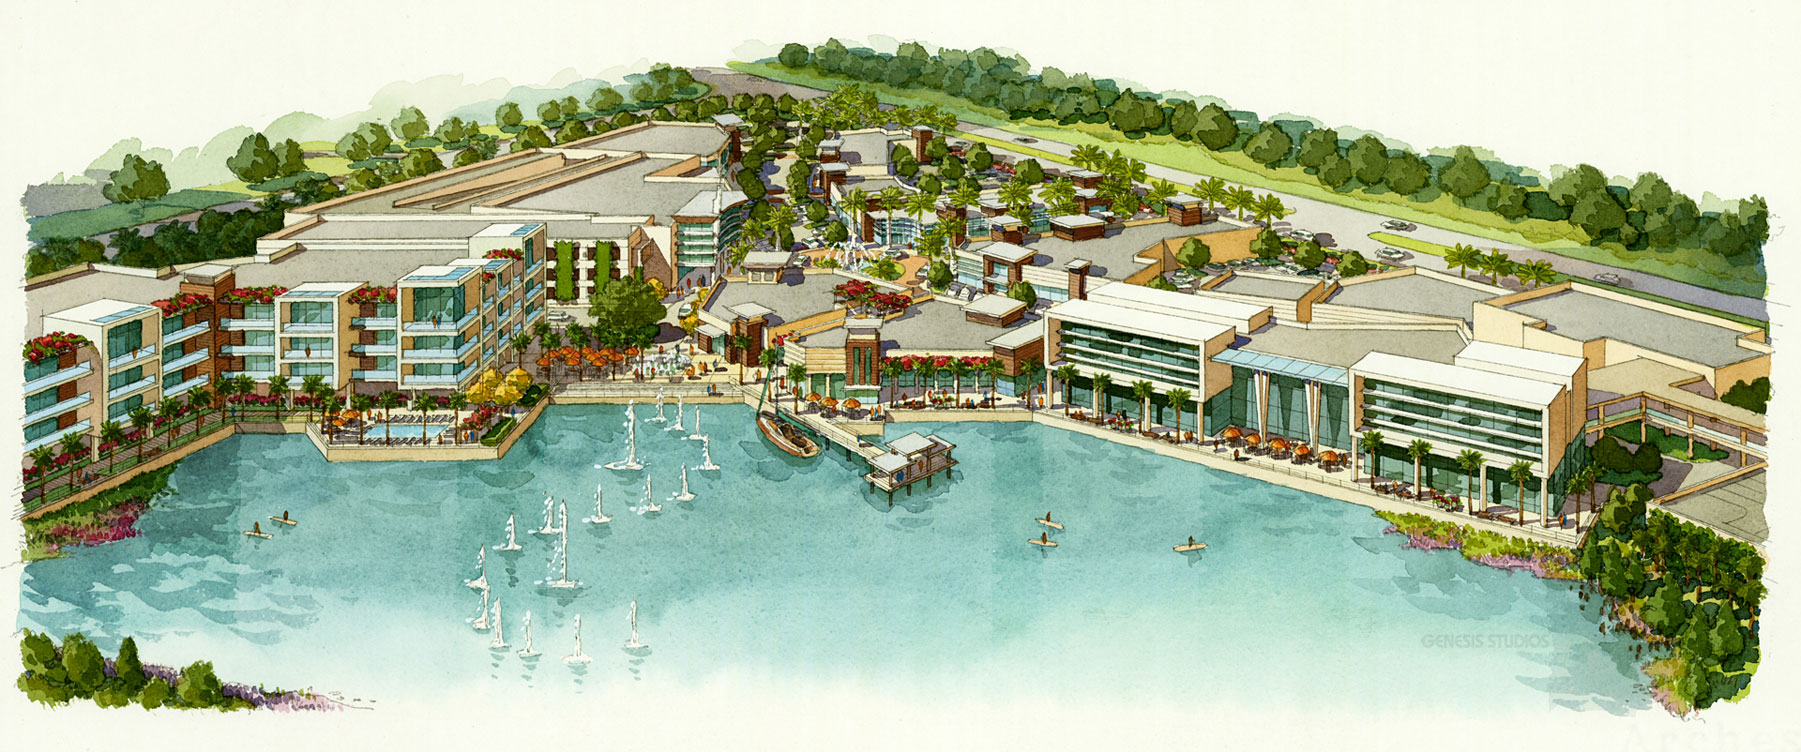 515086 Watercolor Architectural Rendering of Sarasota Bay Aerial for Stantec